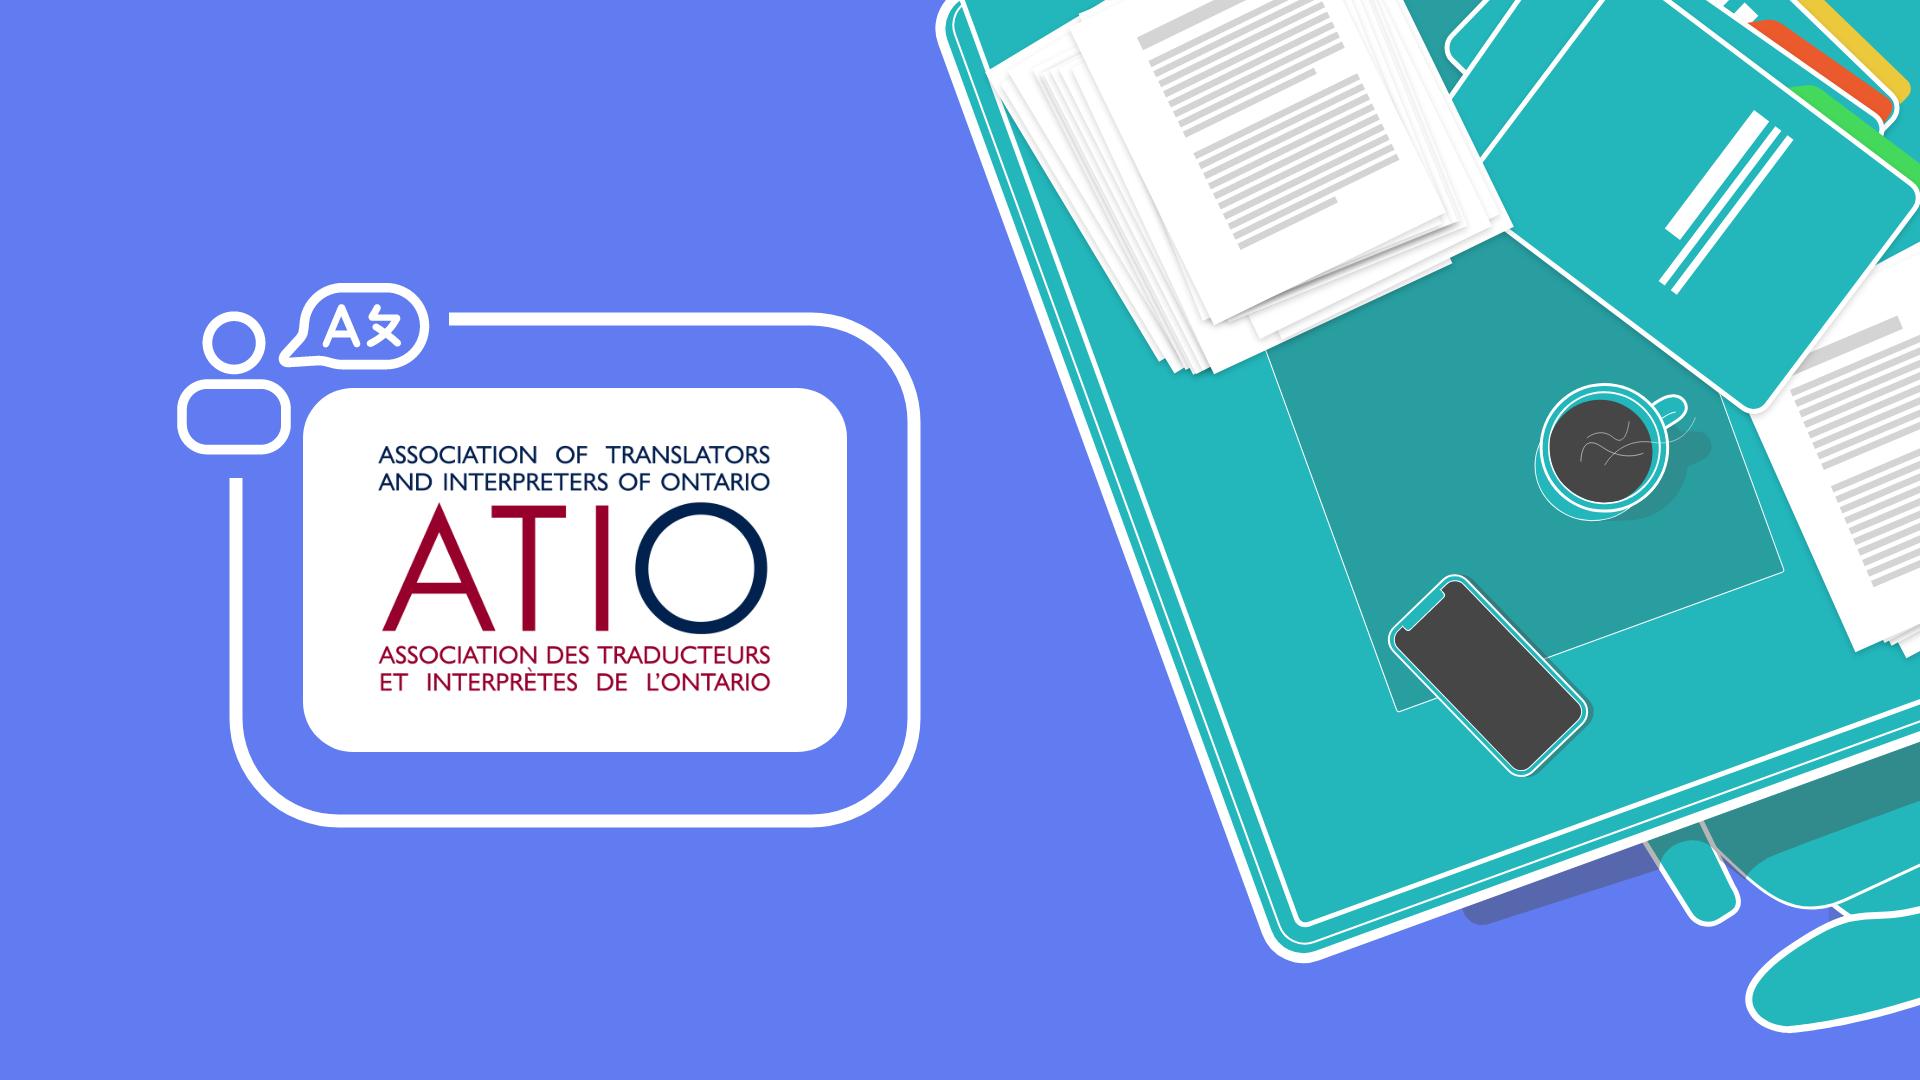 How can I become an ATIO certified translator?